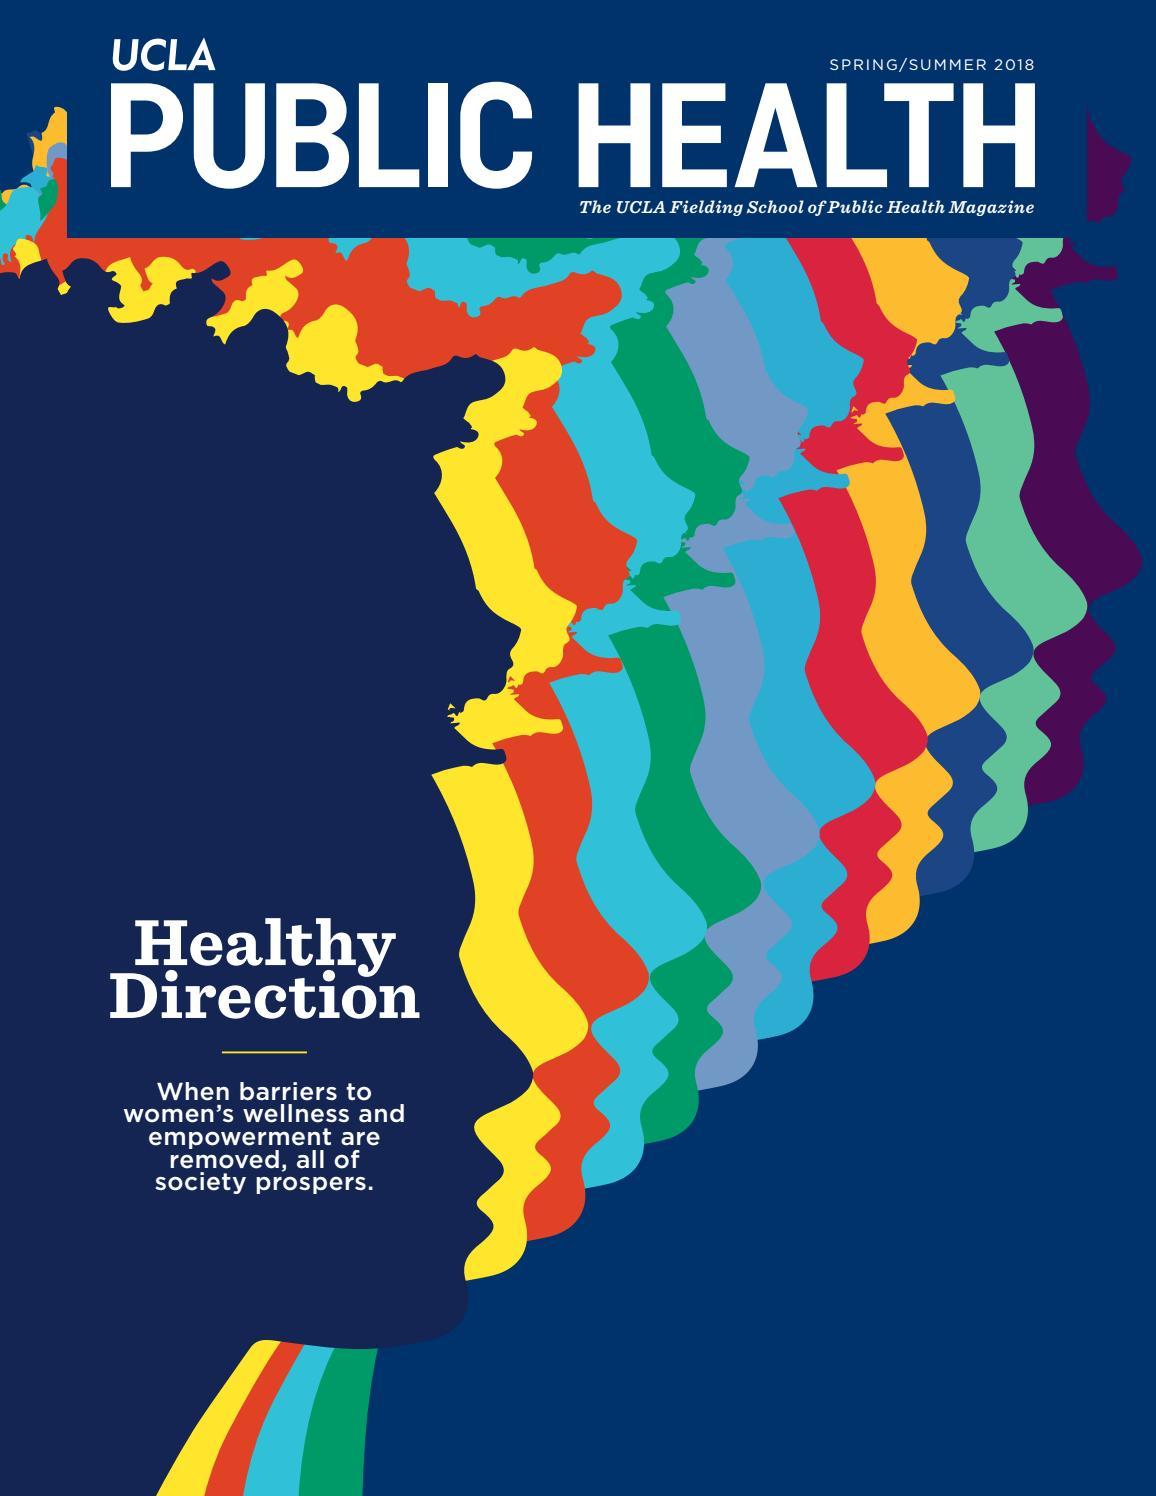 Ucla Fielding School Of Public Health Magazine Springsummer 2018